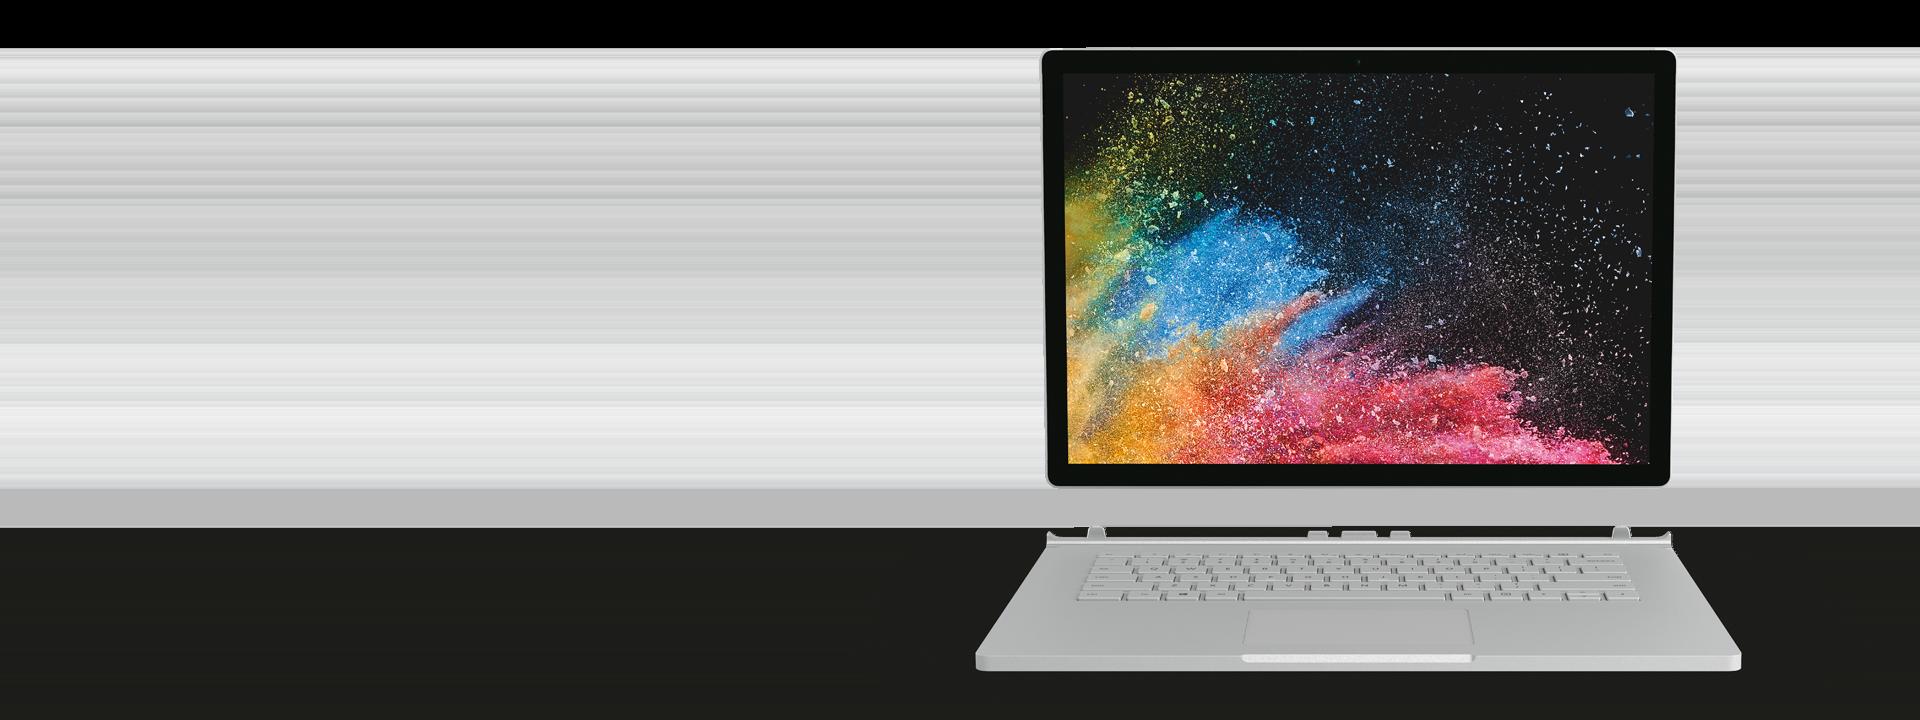 Surface Book 2 met 15 inch PixelSense™-scherm